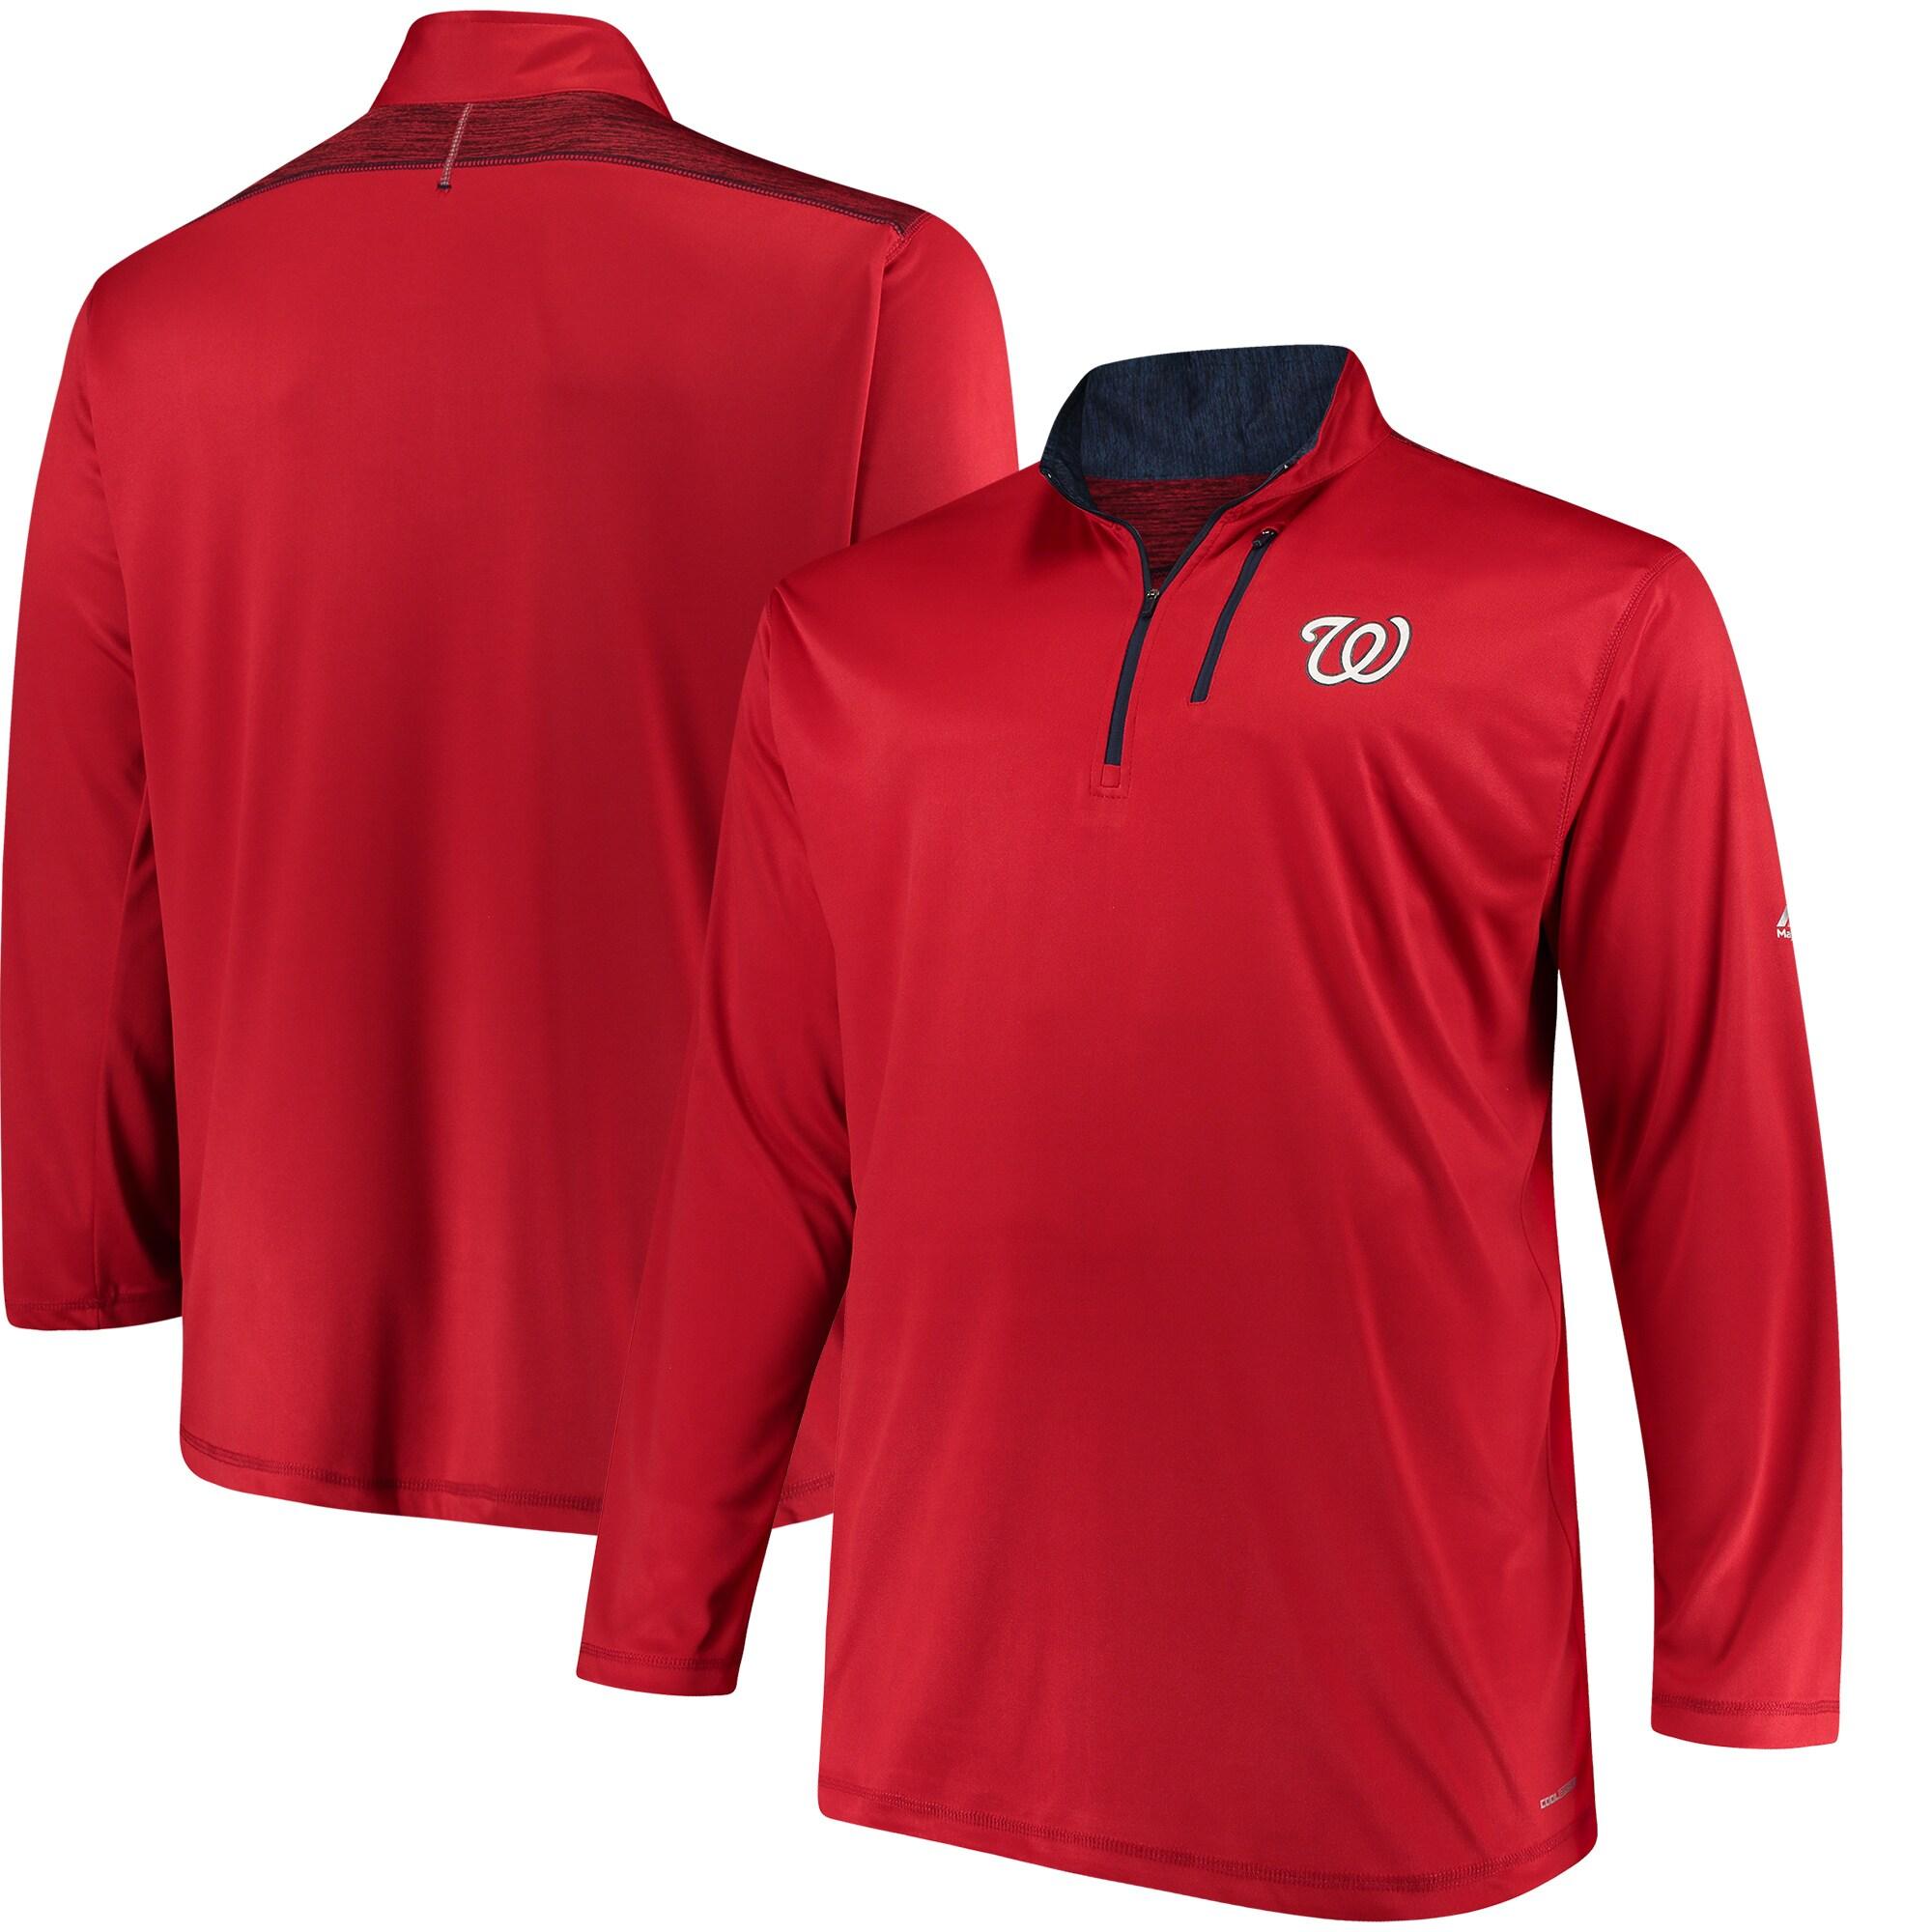 Washington Nationals Majestic Big & Tall 643 Half-Zip Pullover Jacket - Red